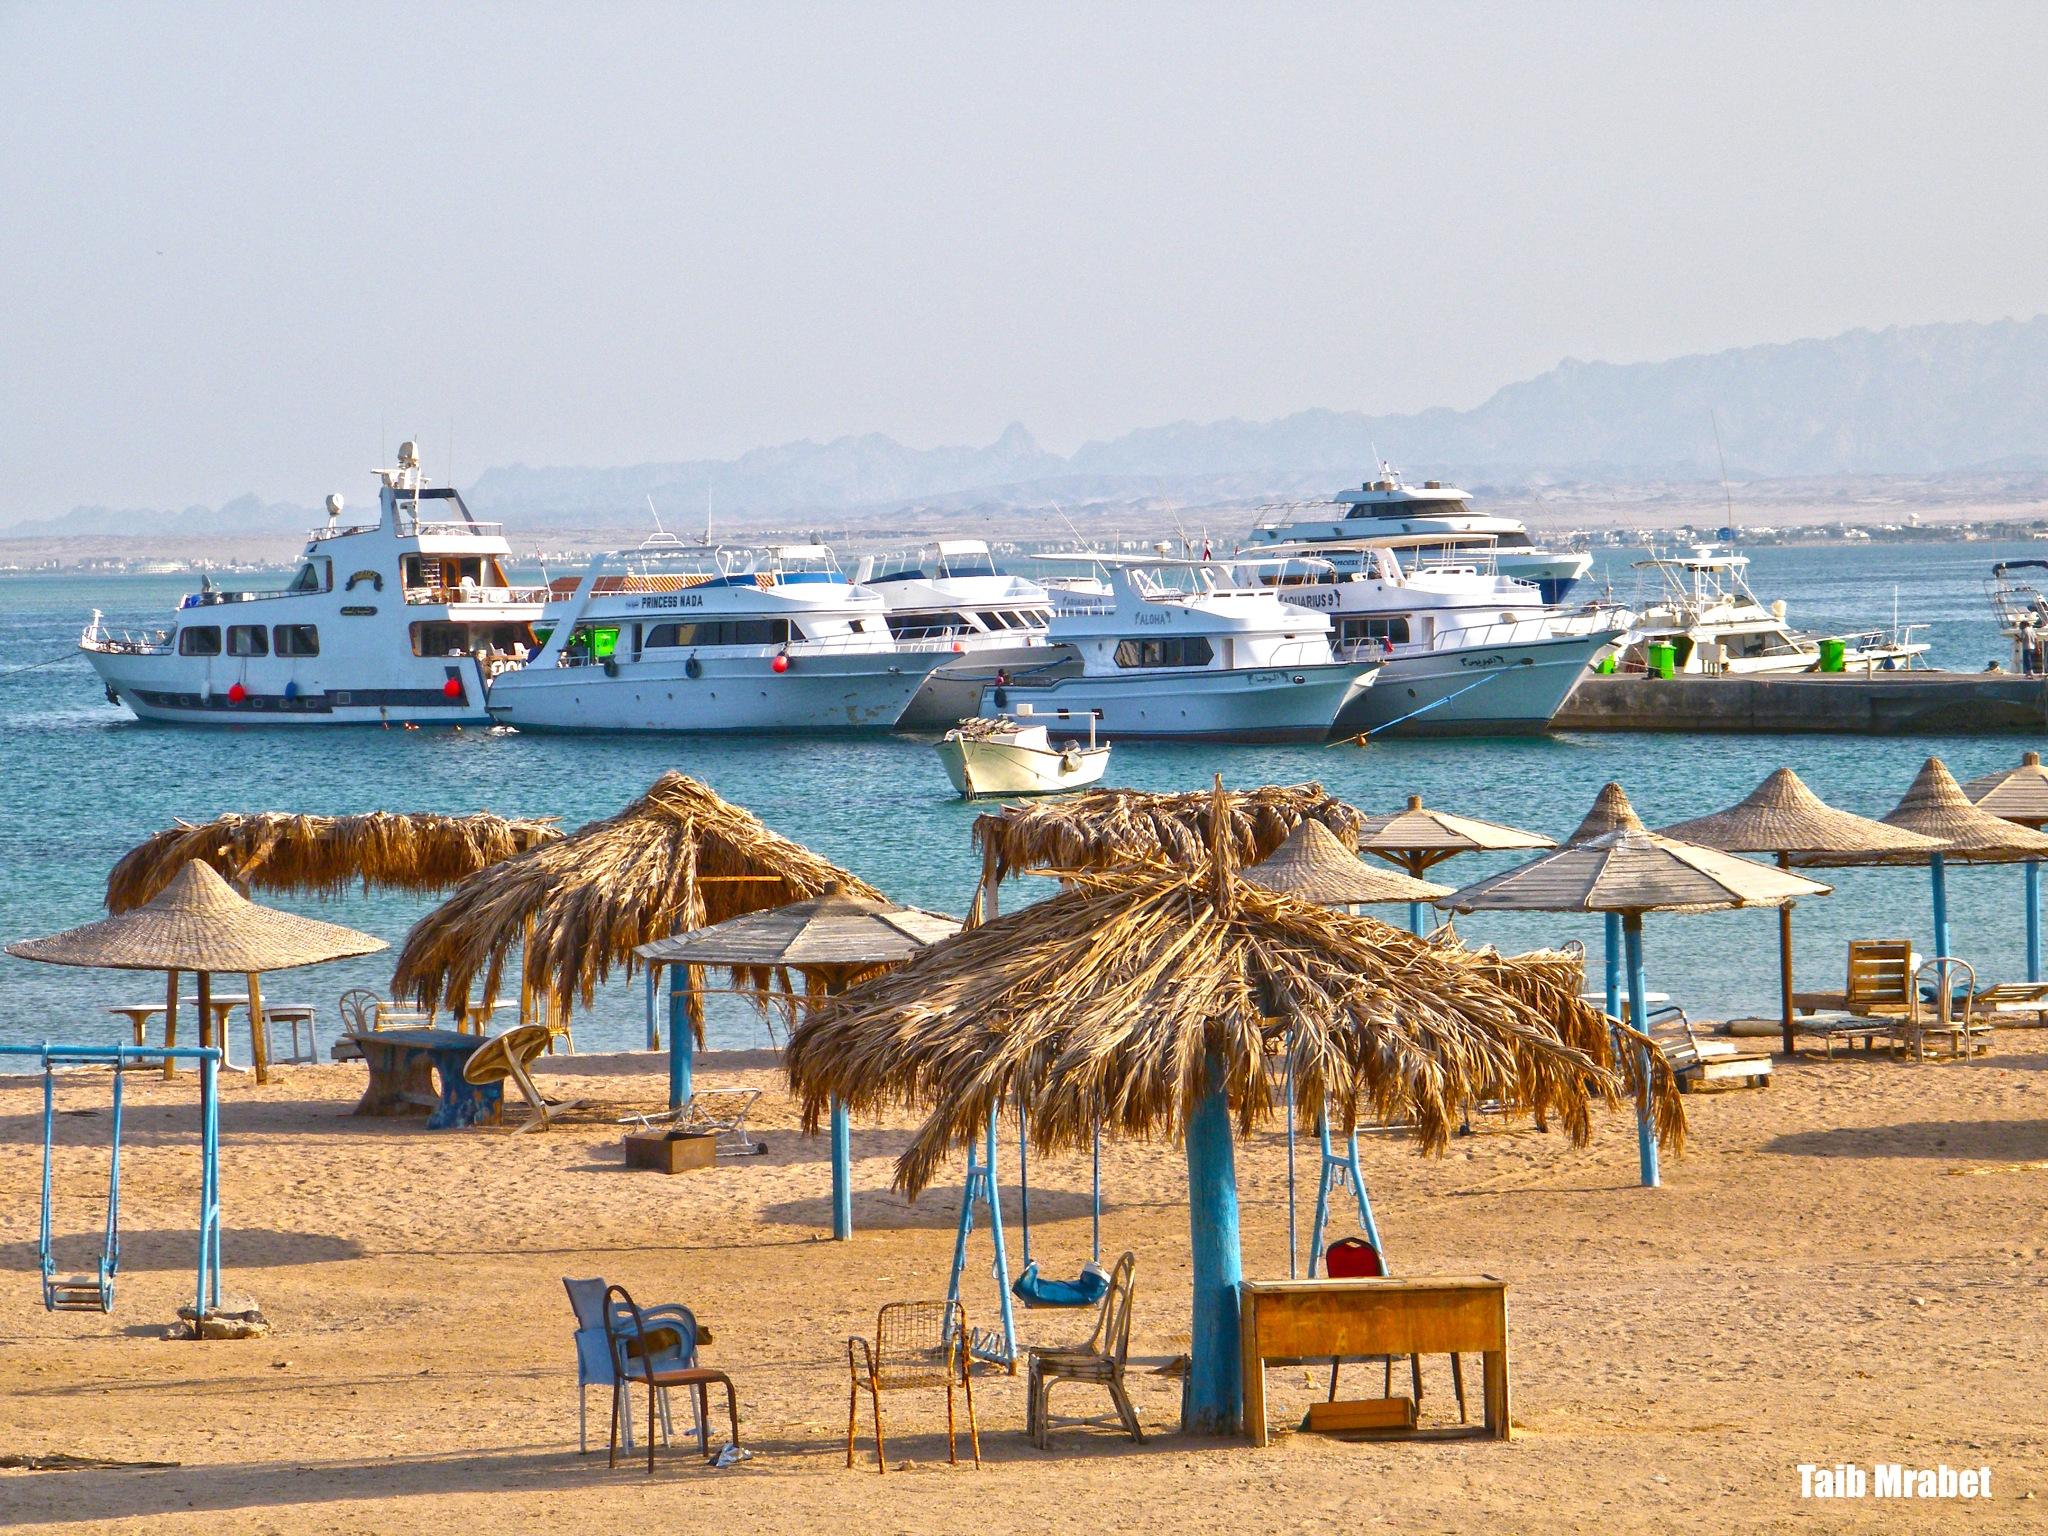 Hurgahada city by Taib MMrabet